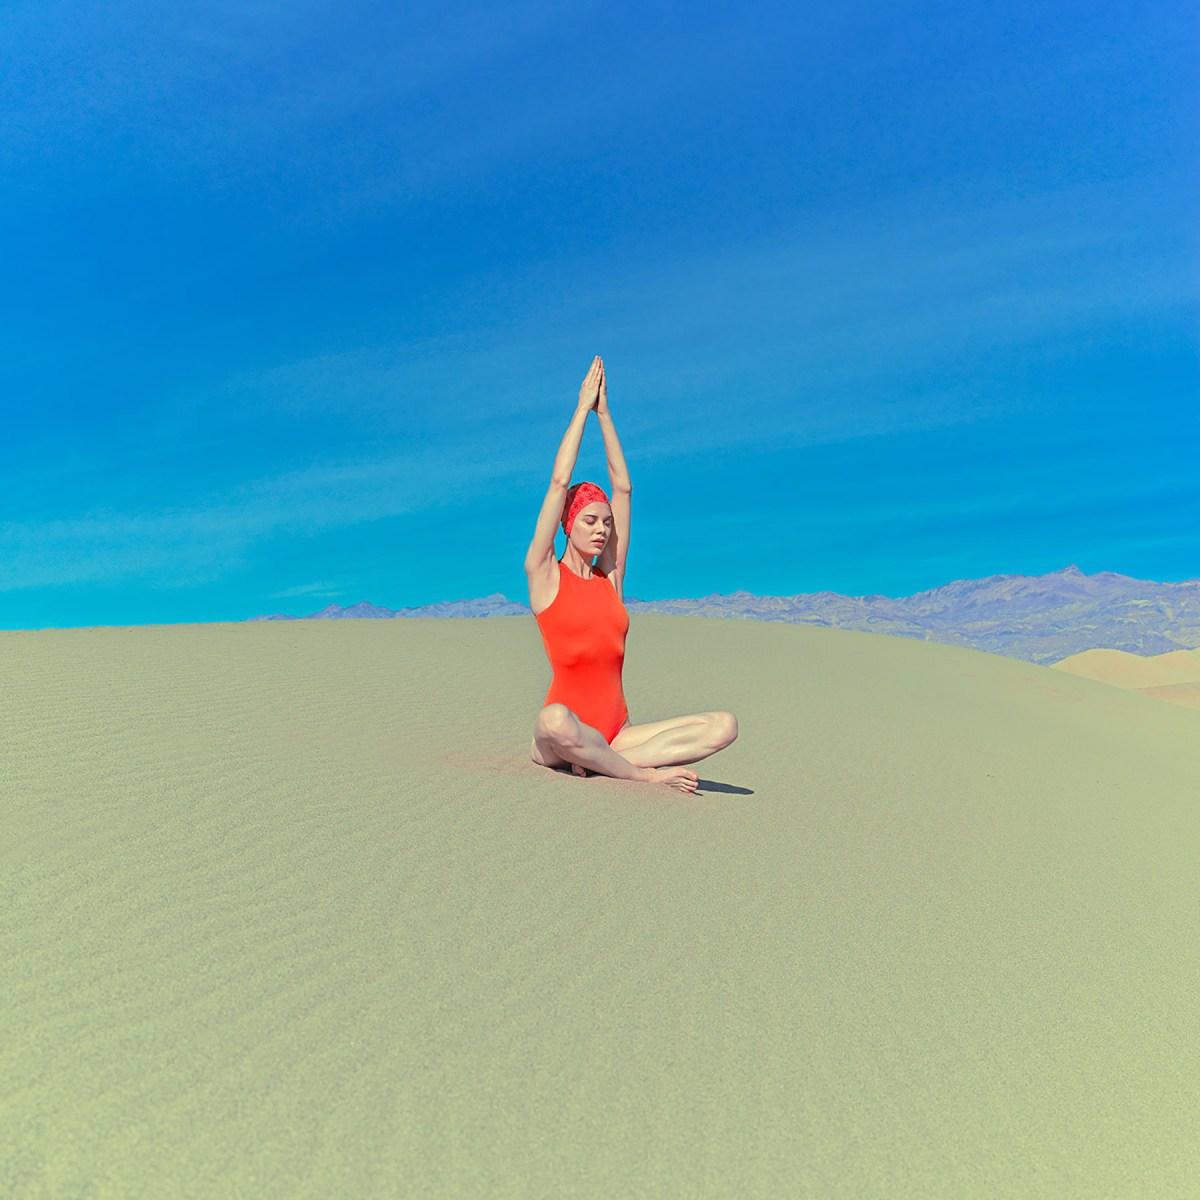 swimmers in the desert